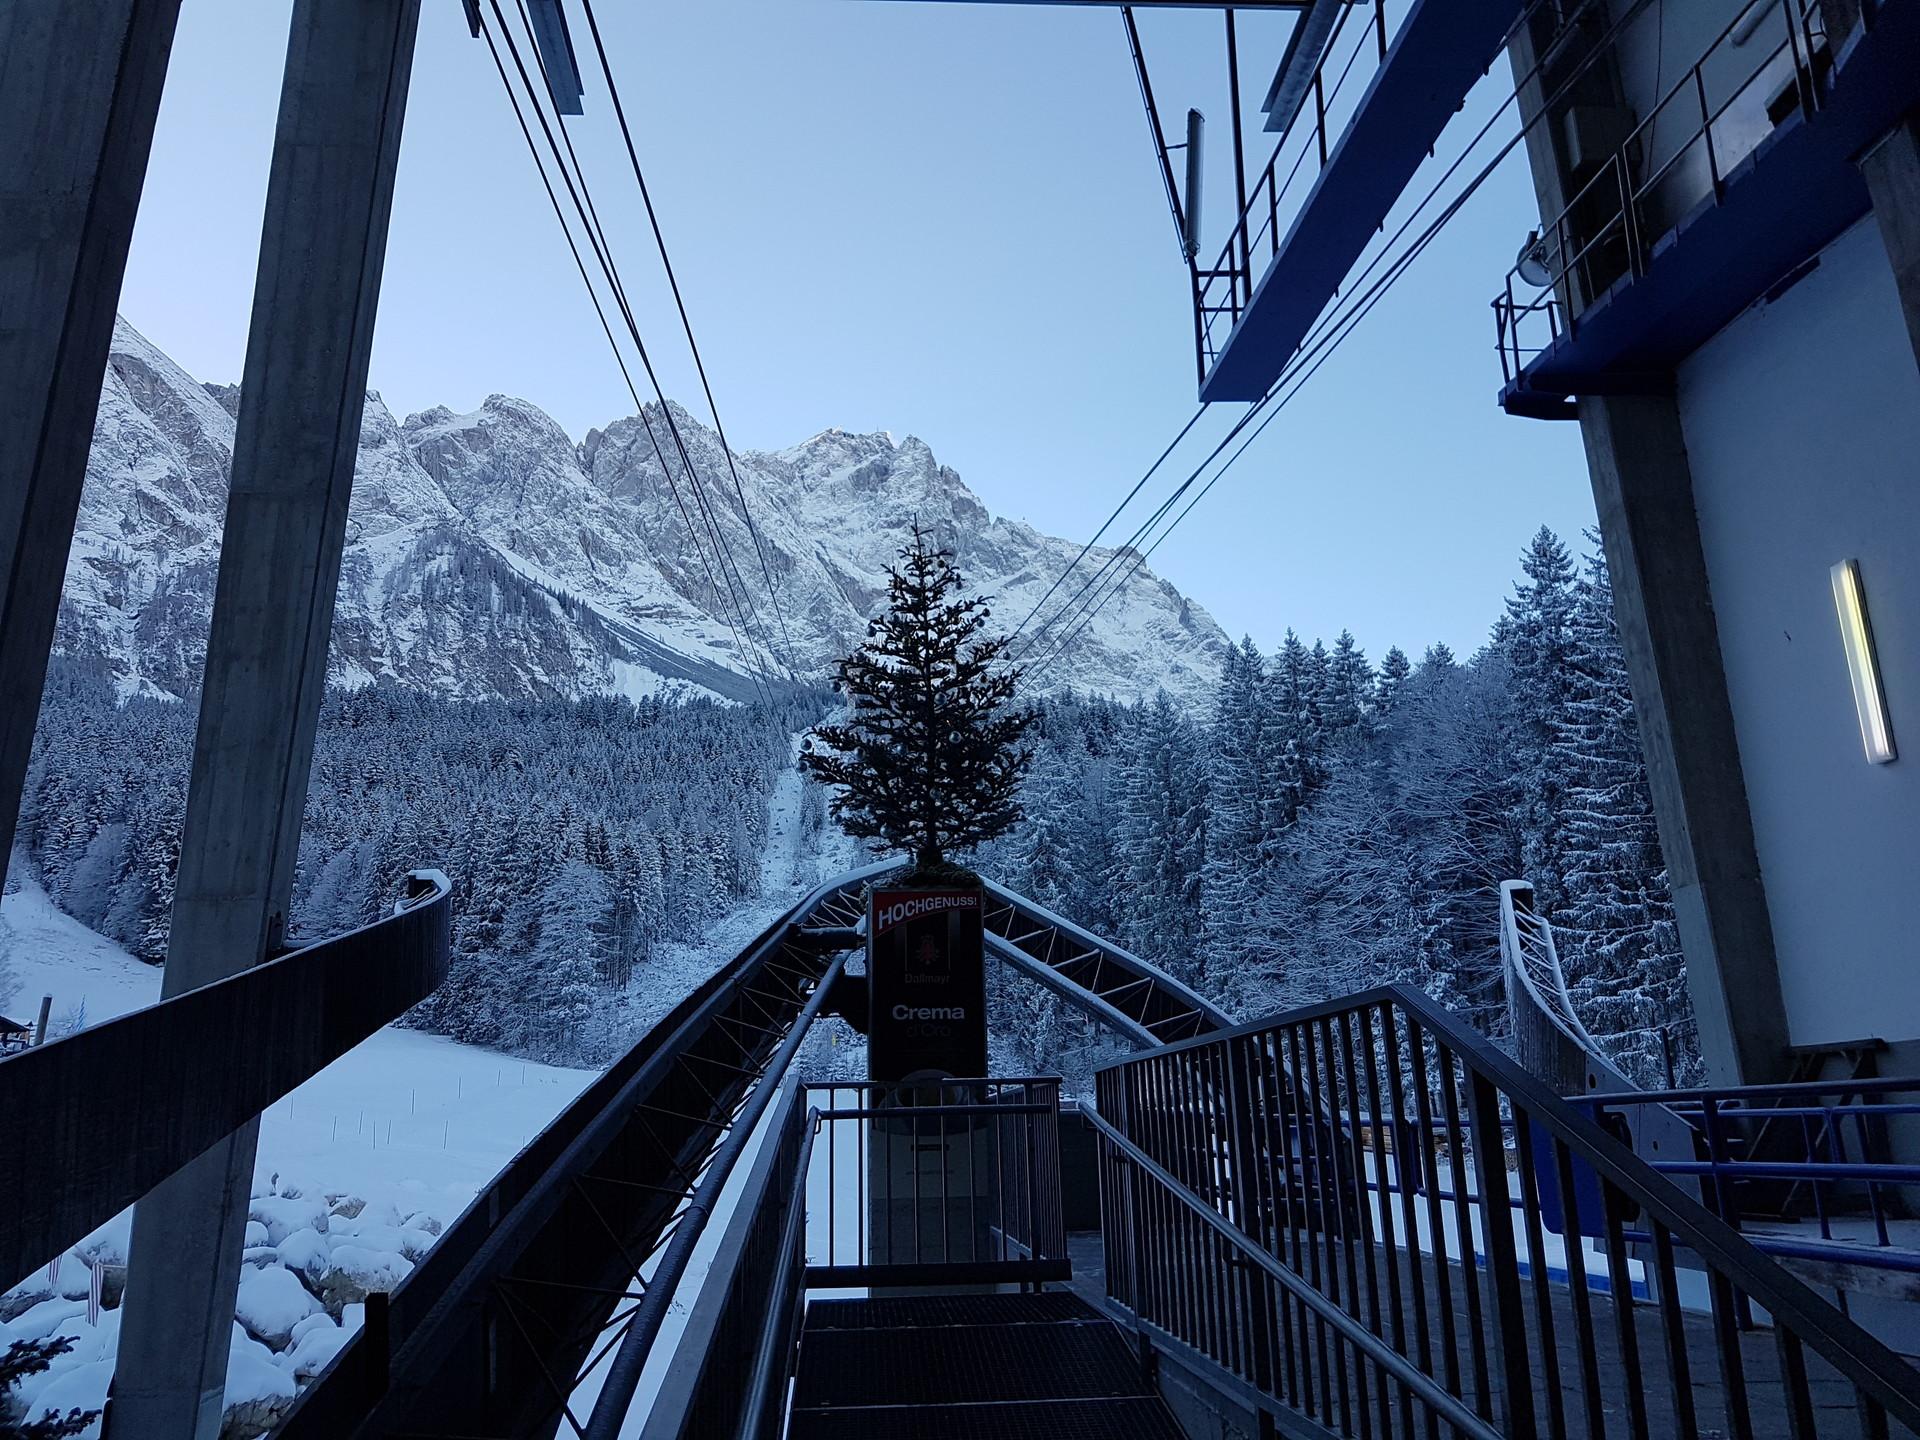 day-trip-journey-top-germany-a593f3b9b1f